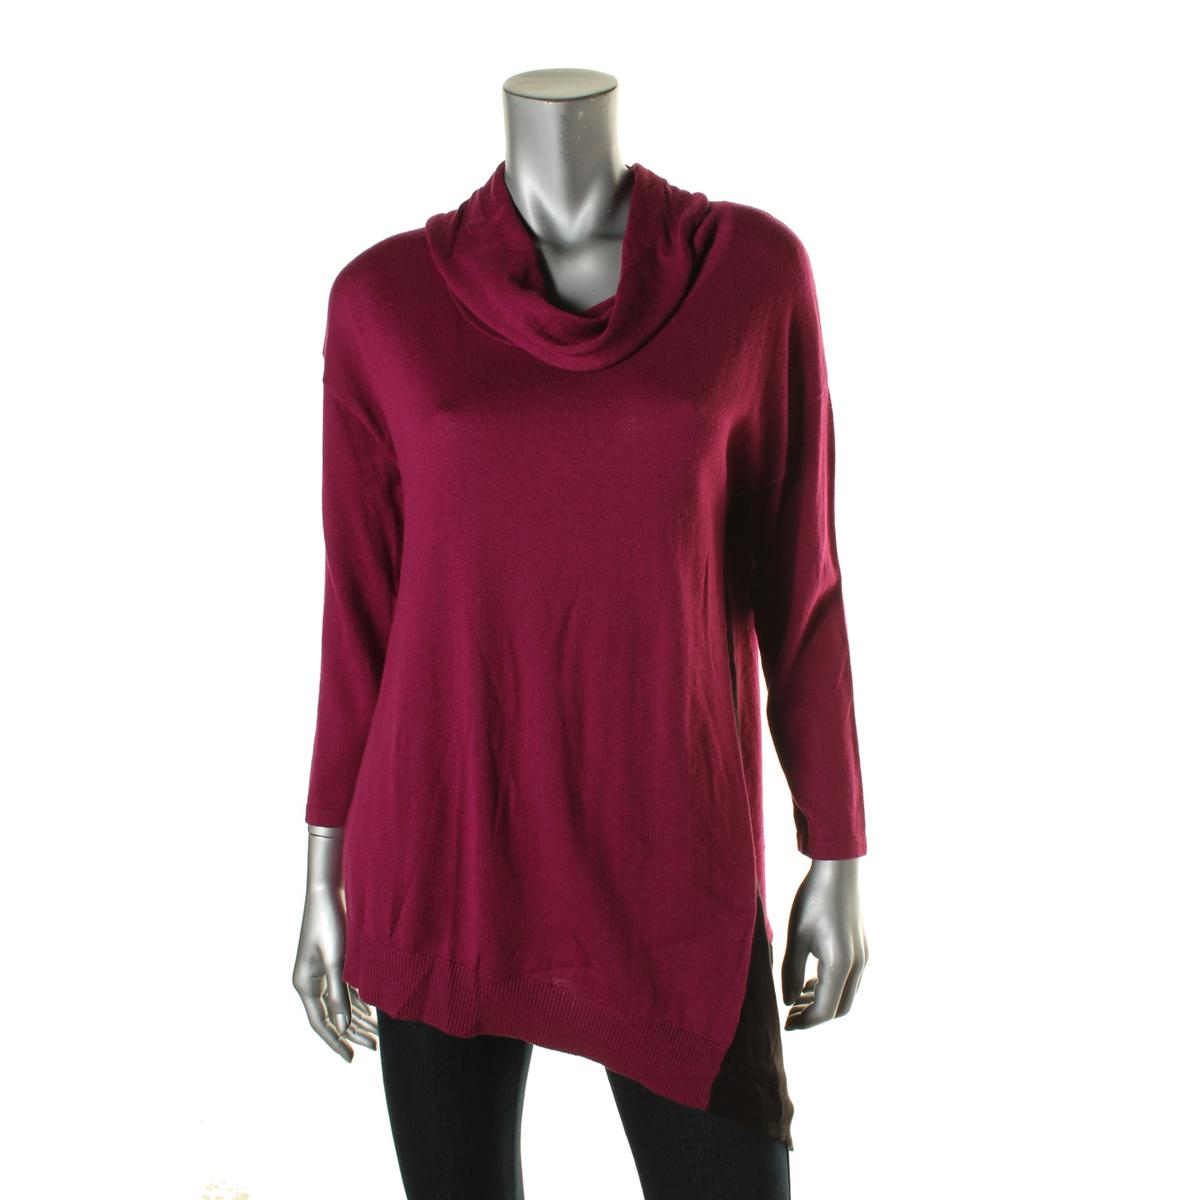 avec 9532 womens knit contrast trim long sleeves pullover. Black Bedroom Furniture Sets. Home Design Ideas